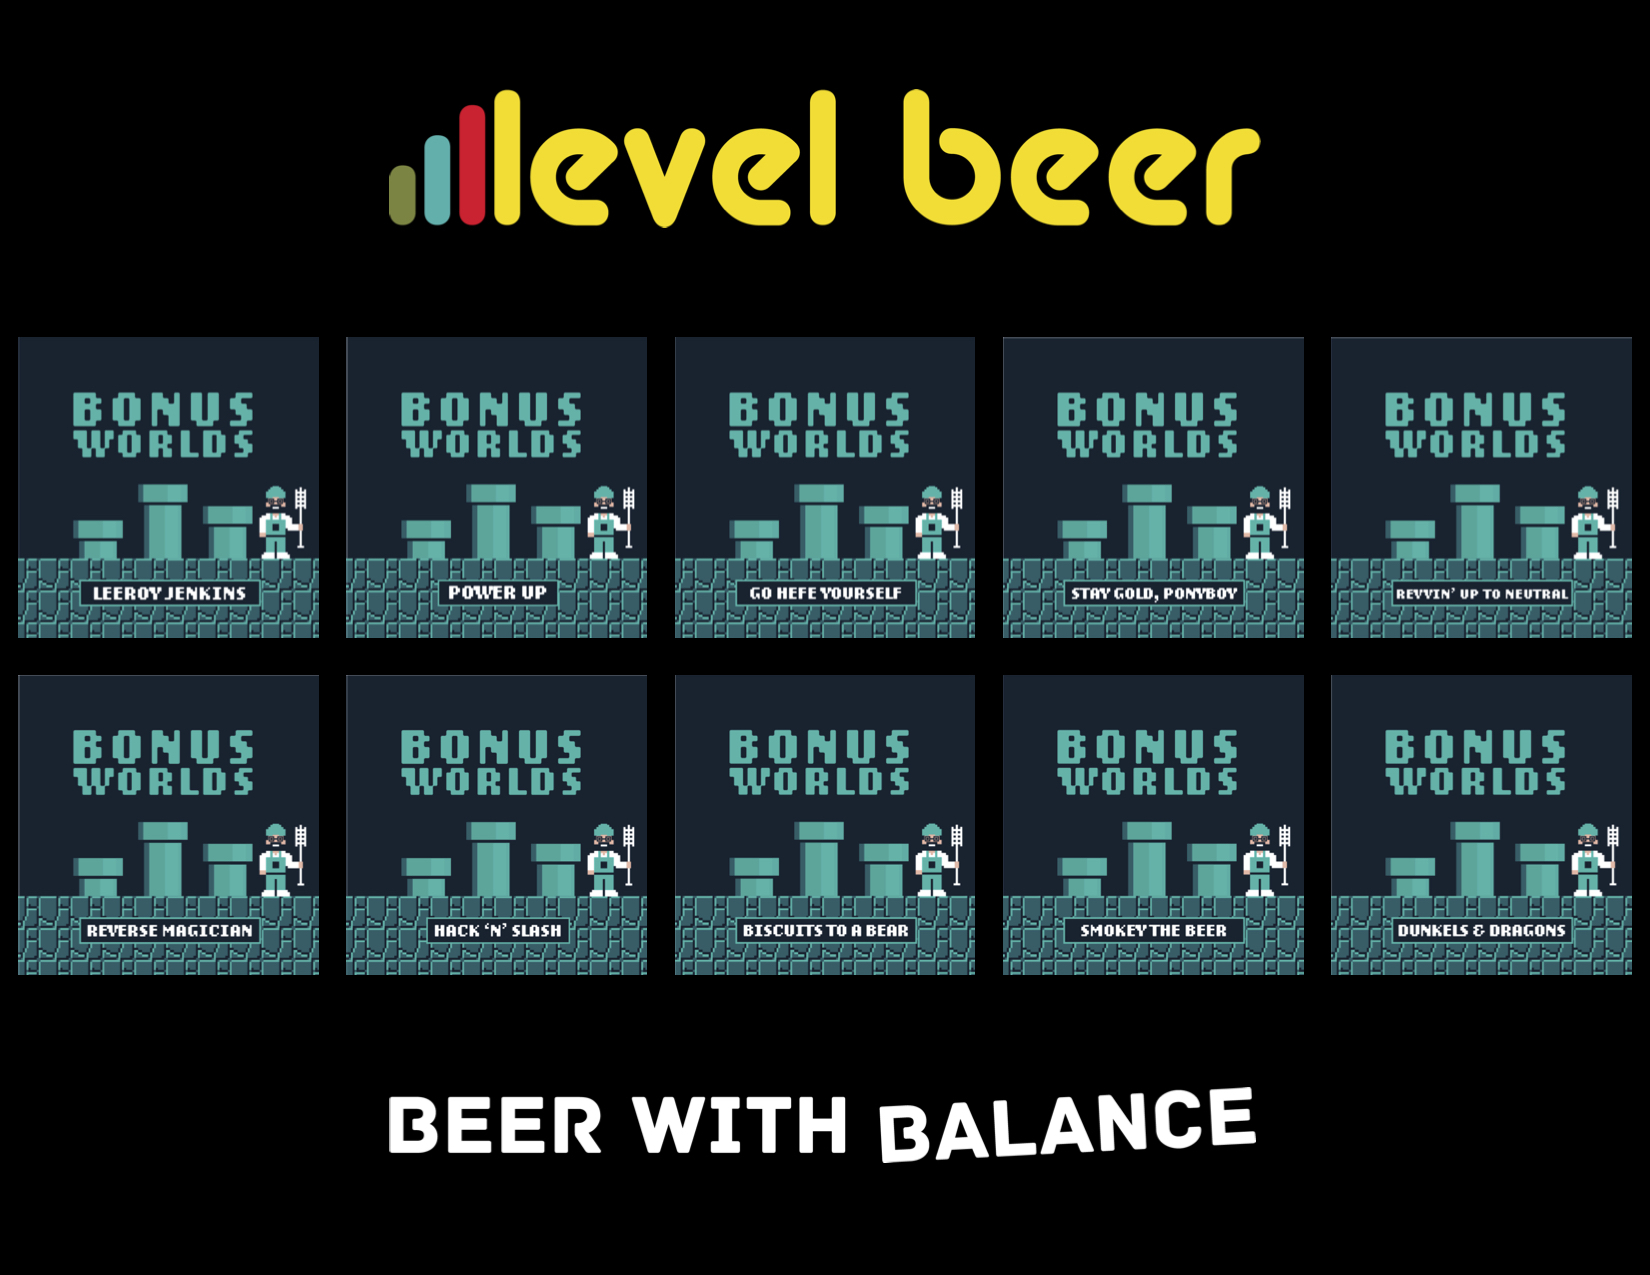 Level Beer Bonus Worlds